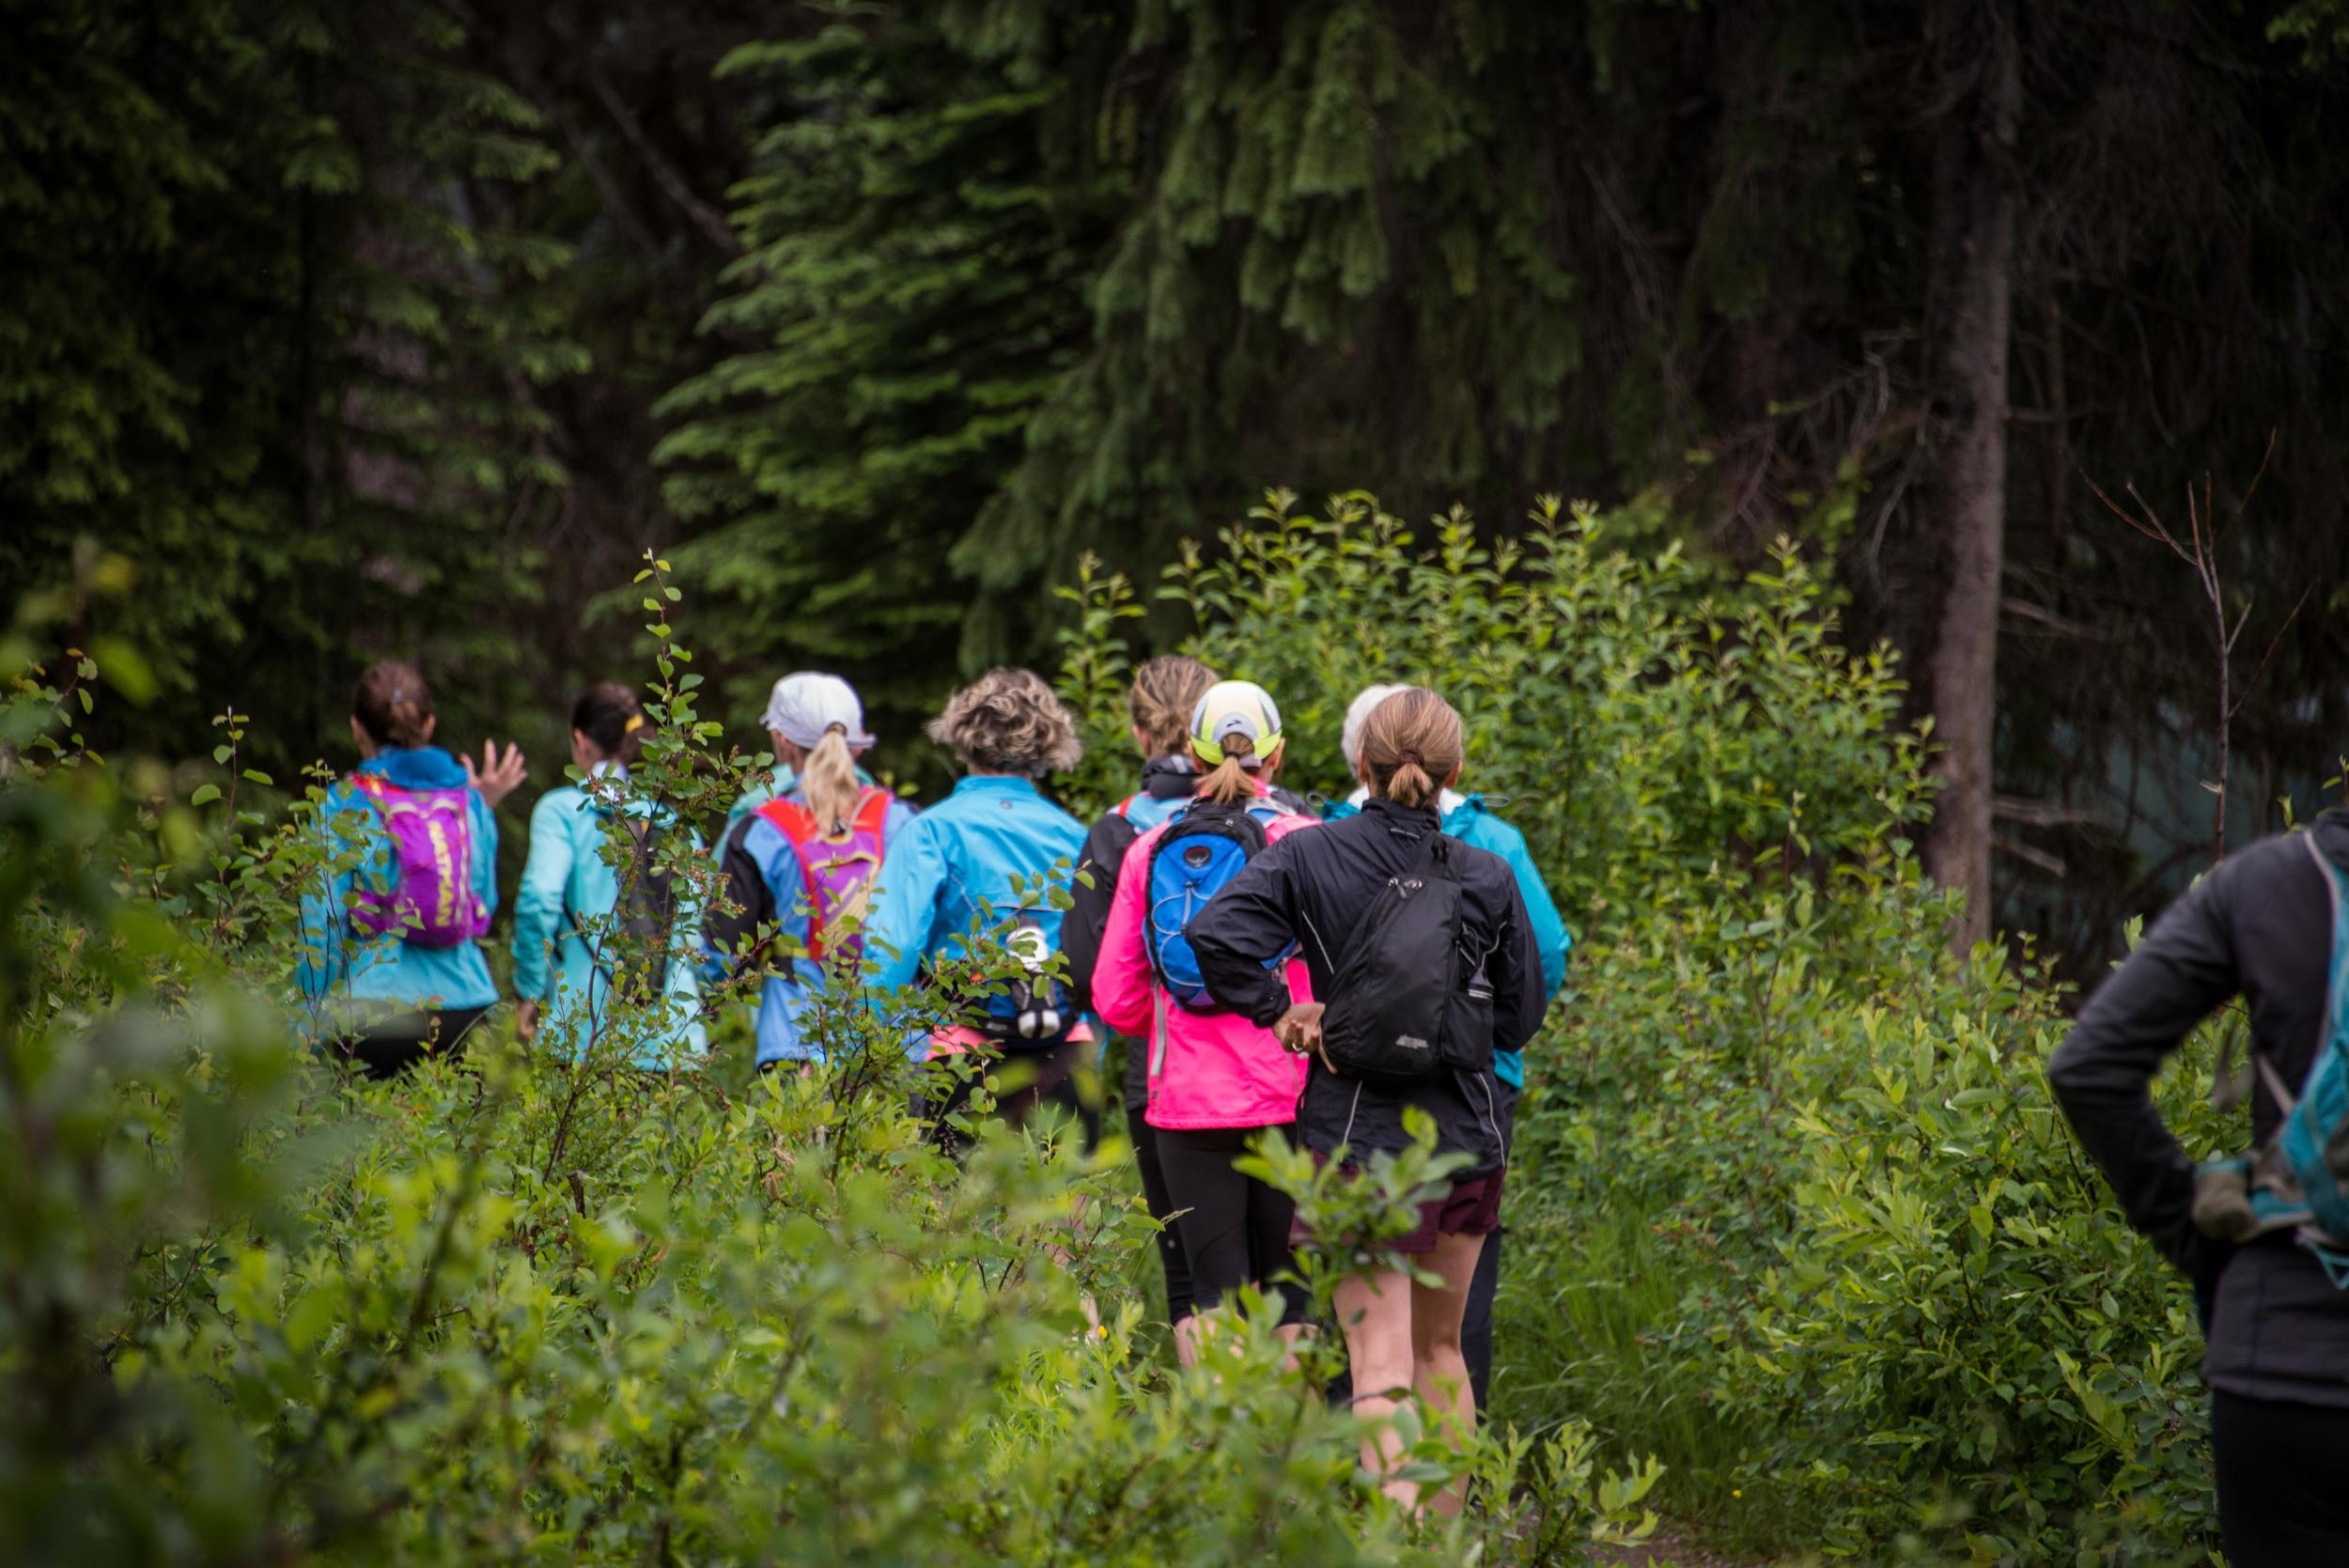 running-yoga-retreat-lush-acomadation-golden-emerald-lake-lodge-69.jpg